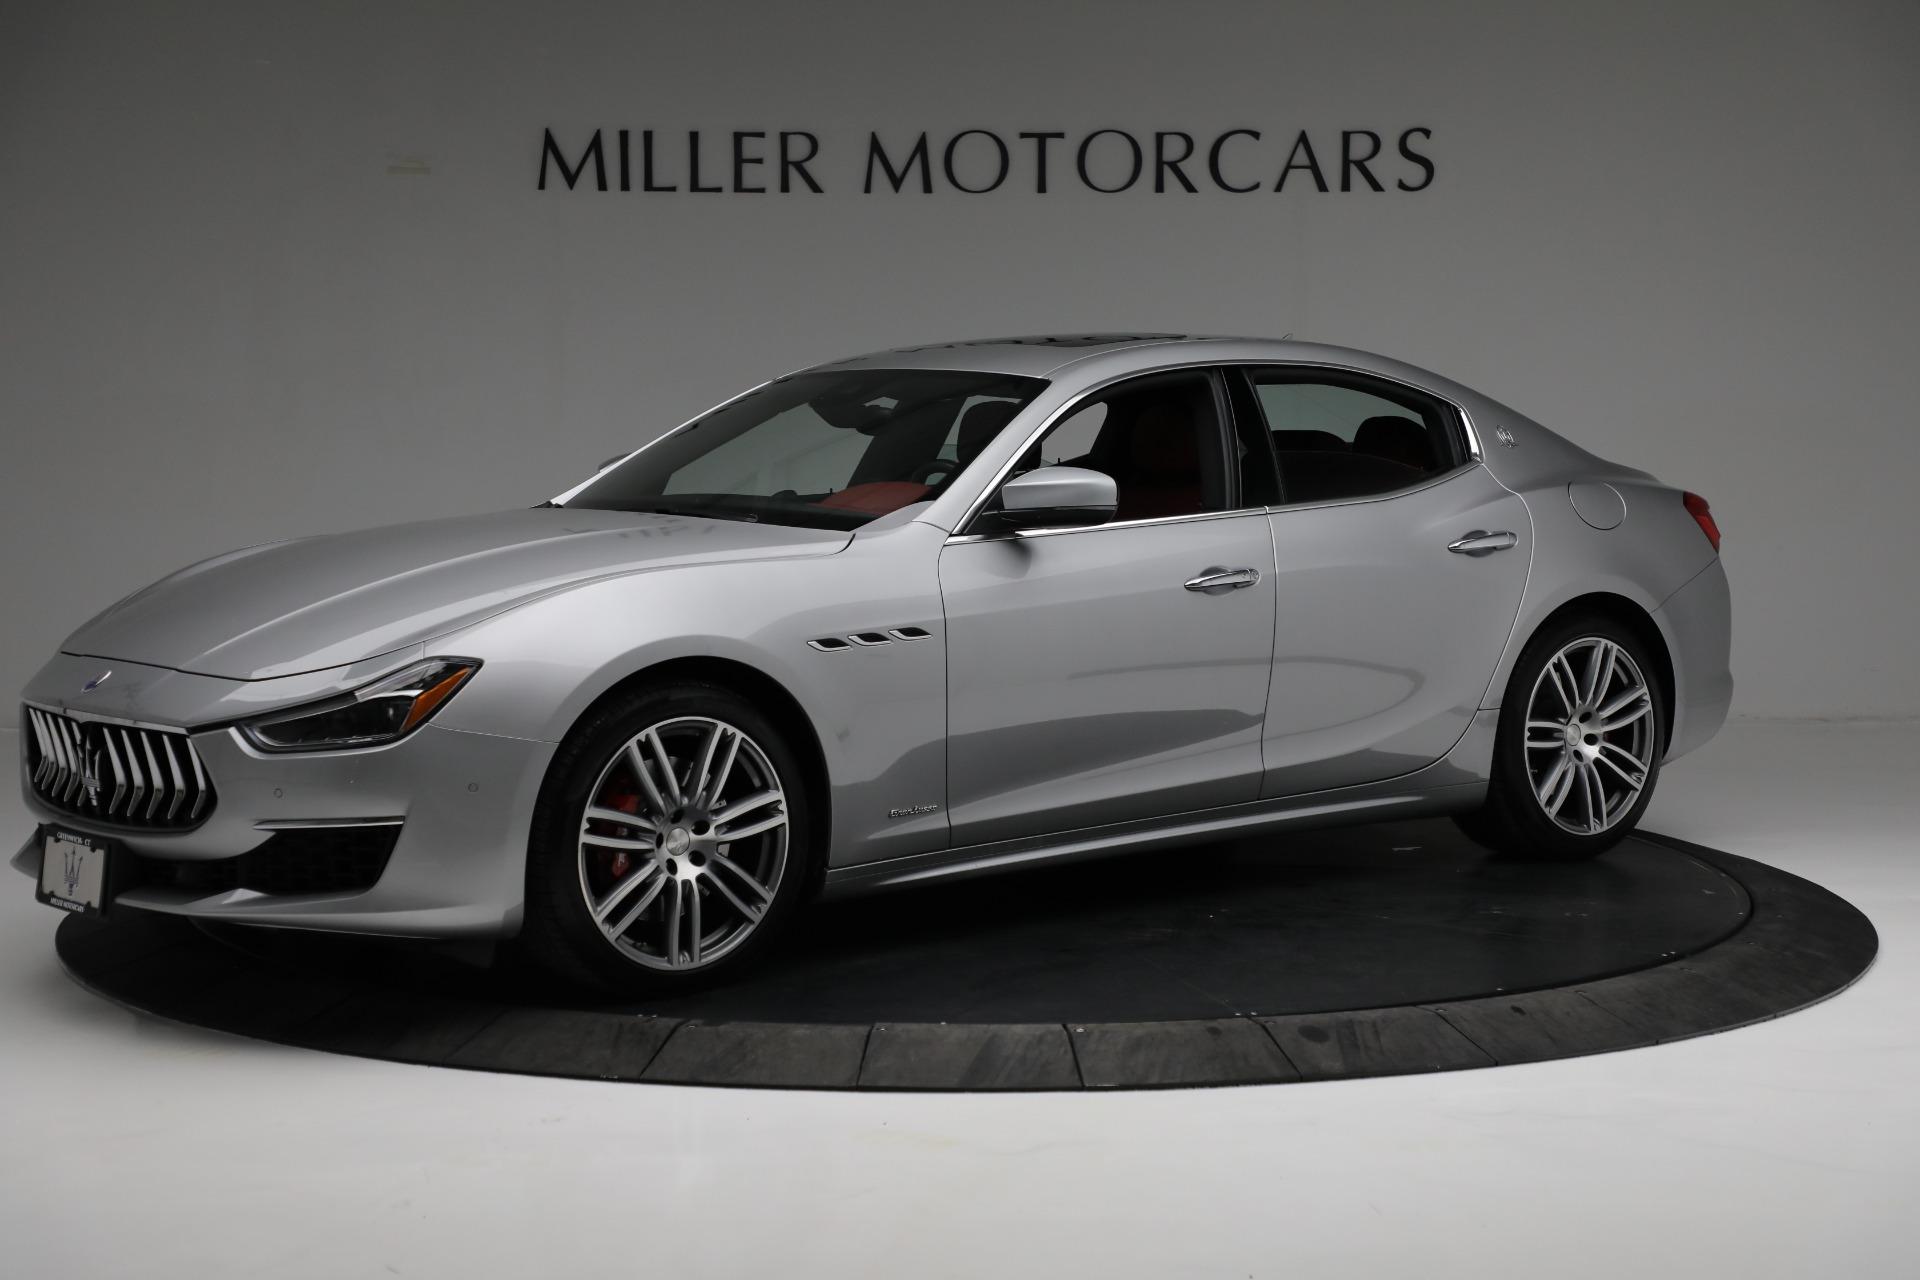 New 2018 Maserati Ghibli S Q4 GranLusso For Sale In Westport, CT 1810_p2